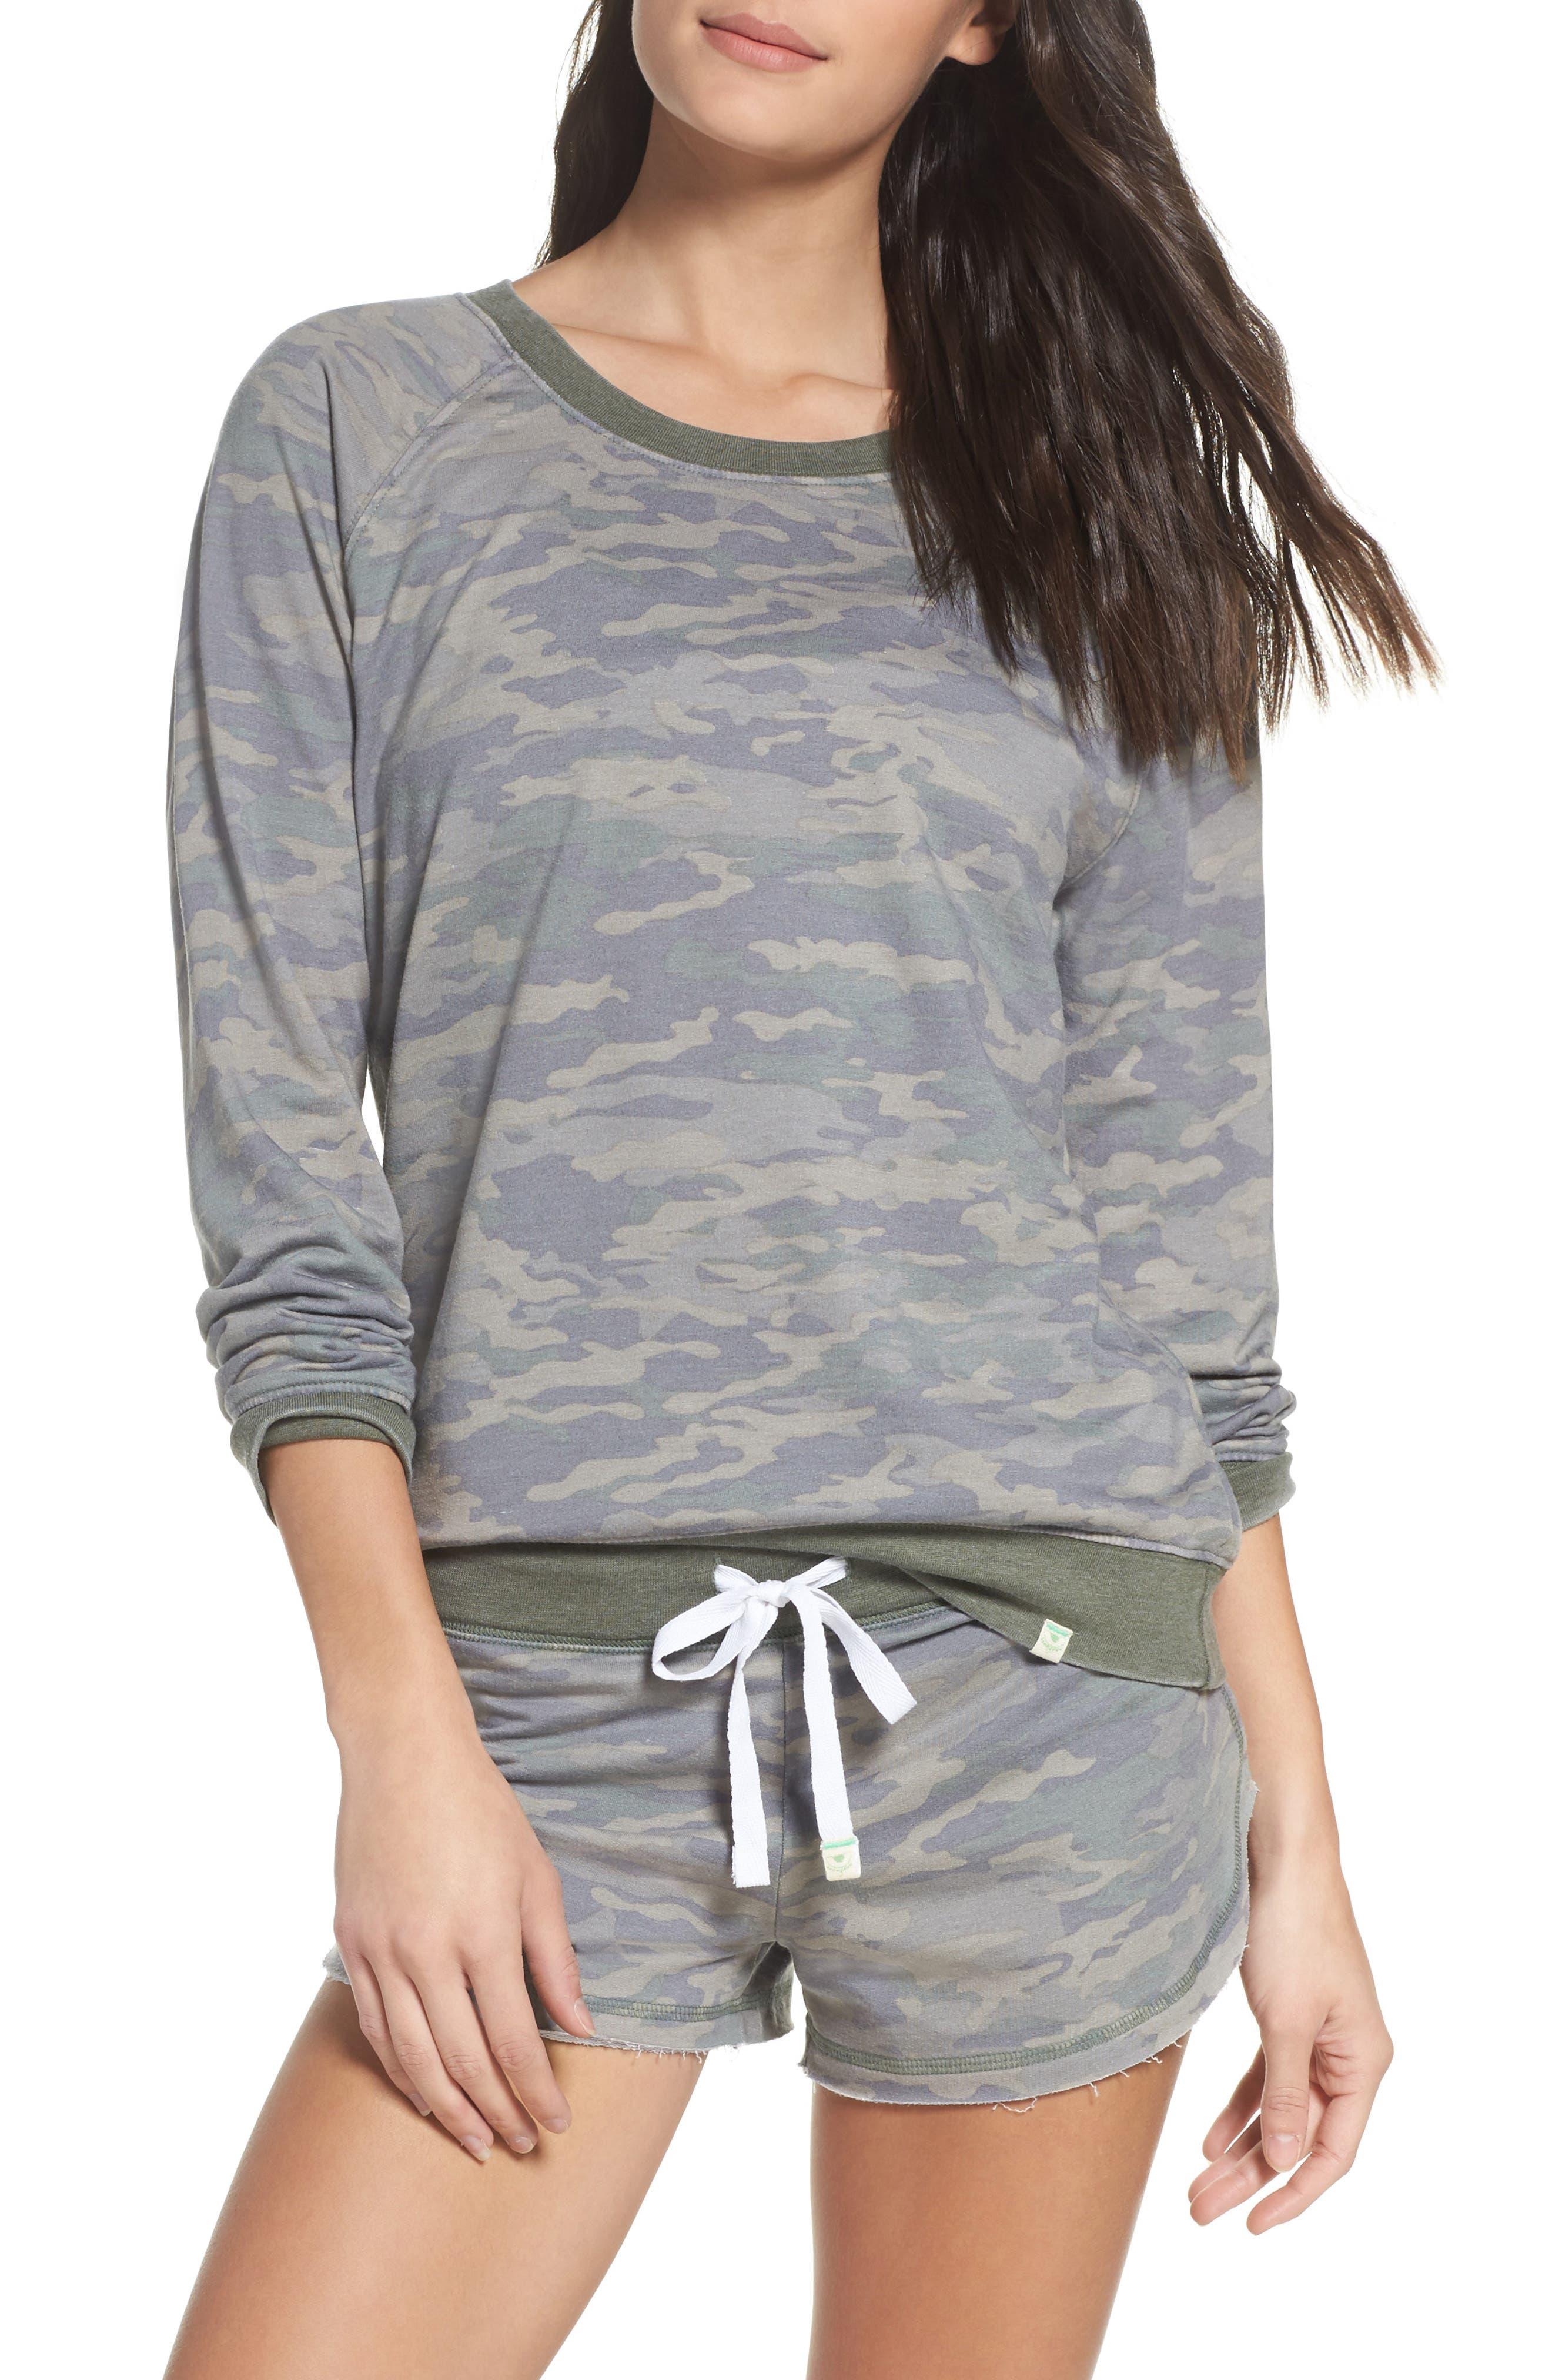 Honeydew Intimates Burnout Lounge Sweatshirt